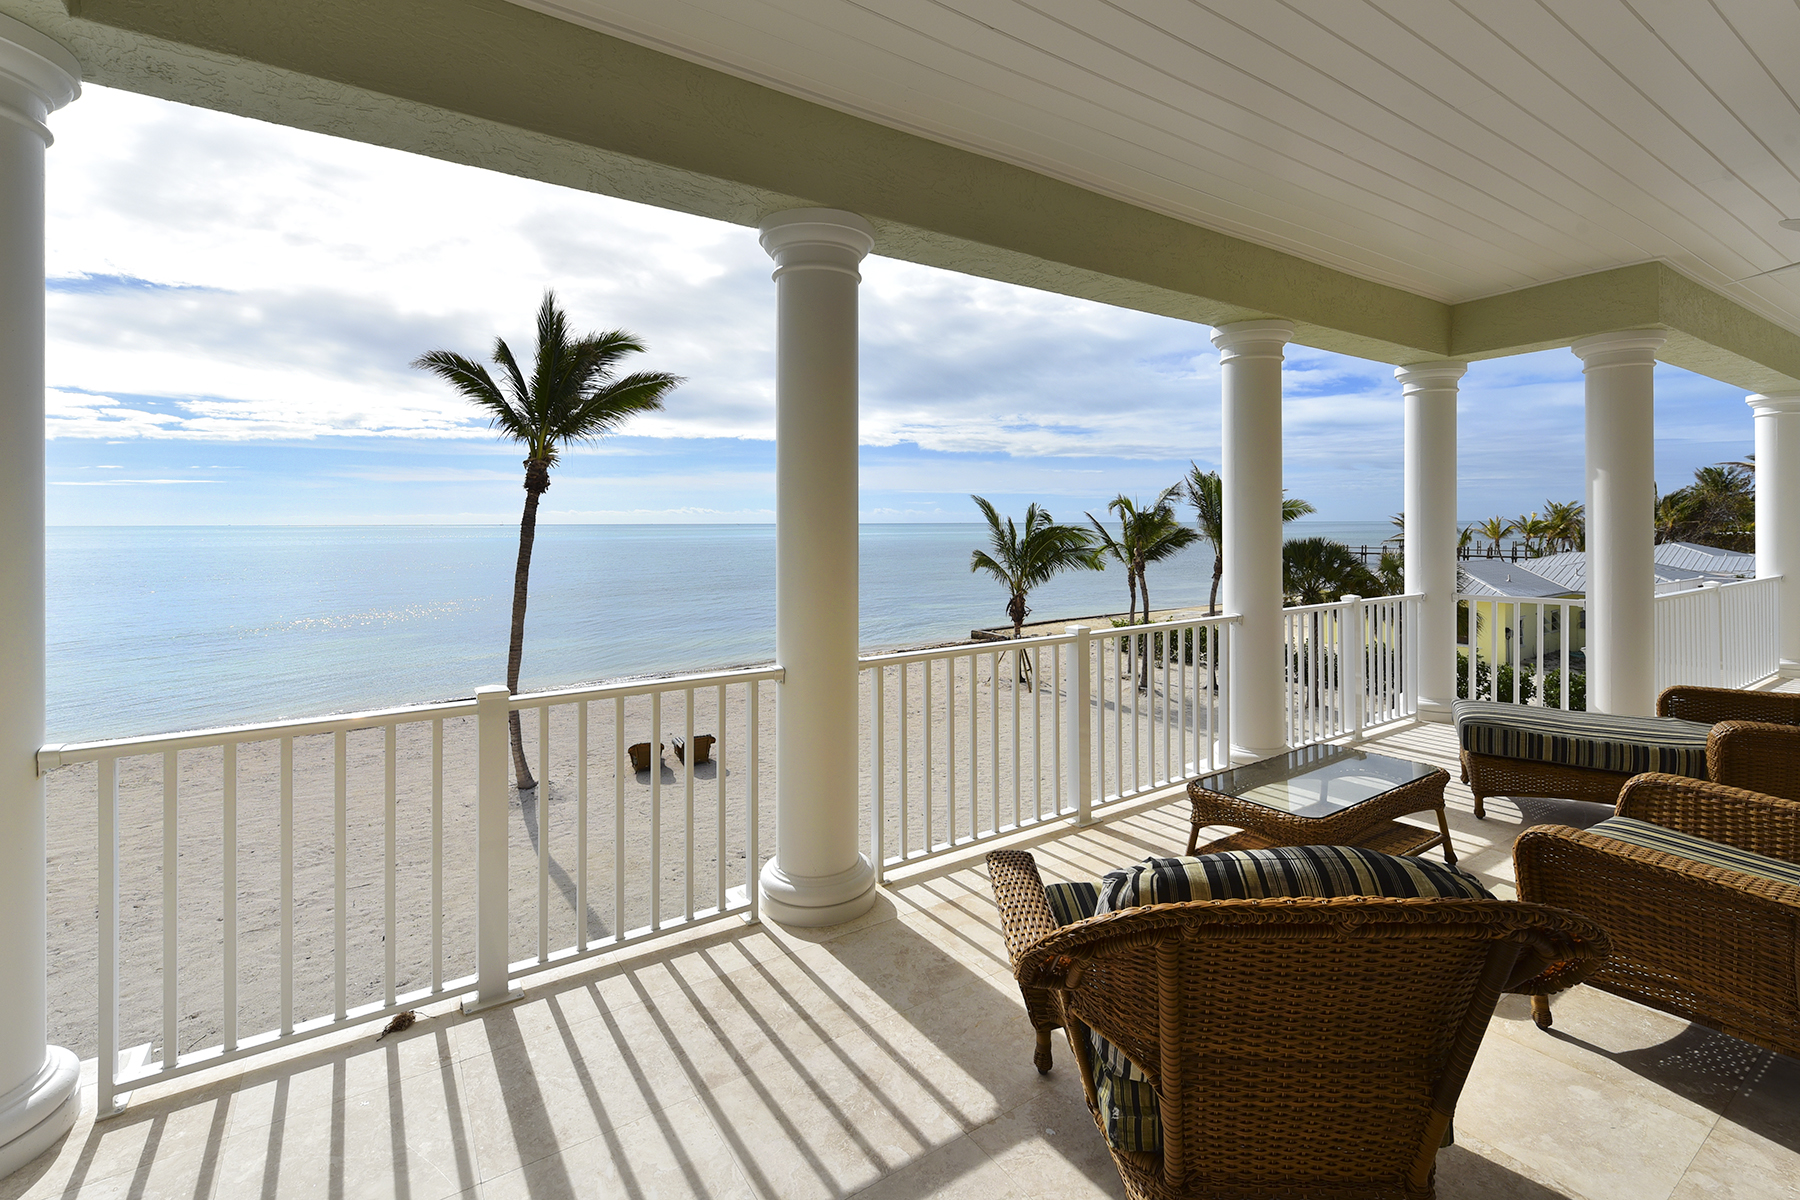 Additional photo for property listing at Exquisite Oceanfront Estate 75931 Overseas Highway Islamorada, Florida 33036 Estados Unidos